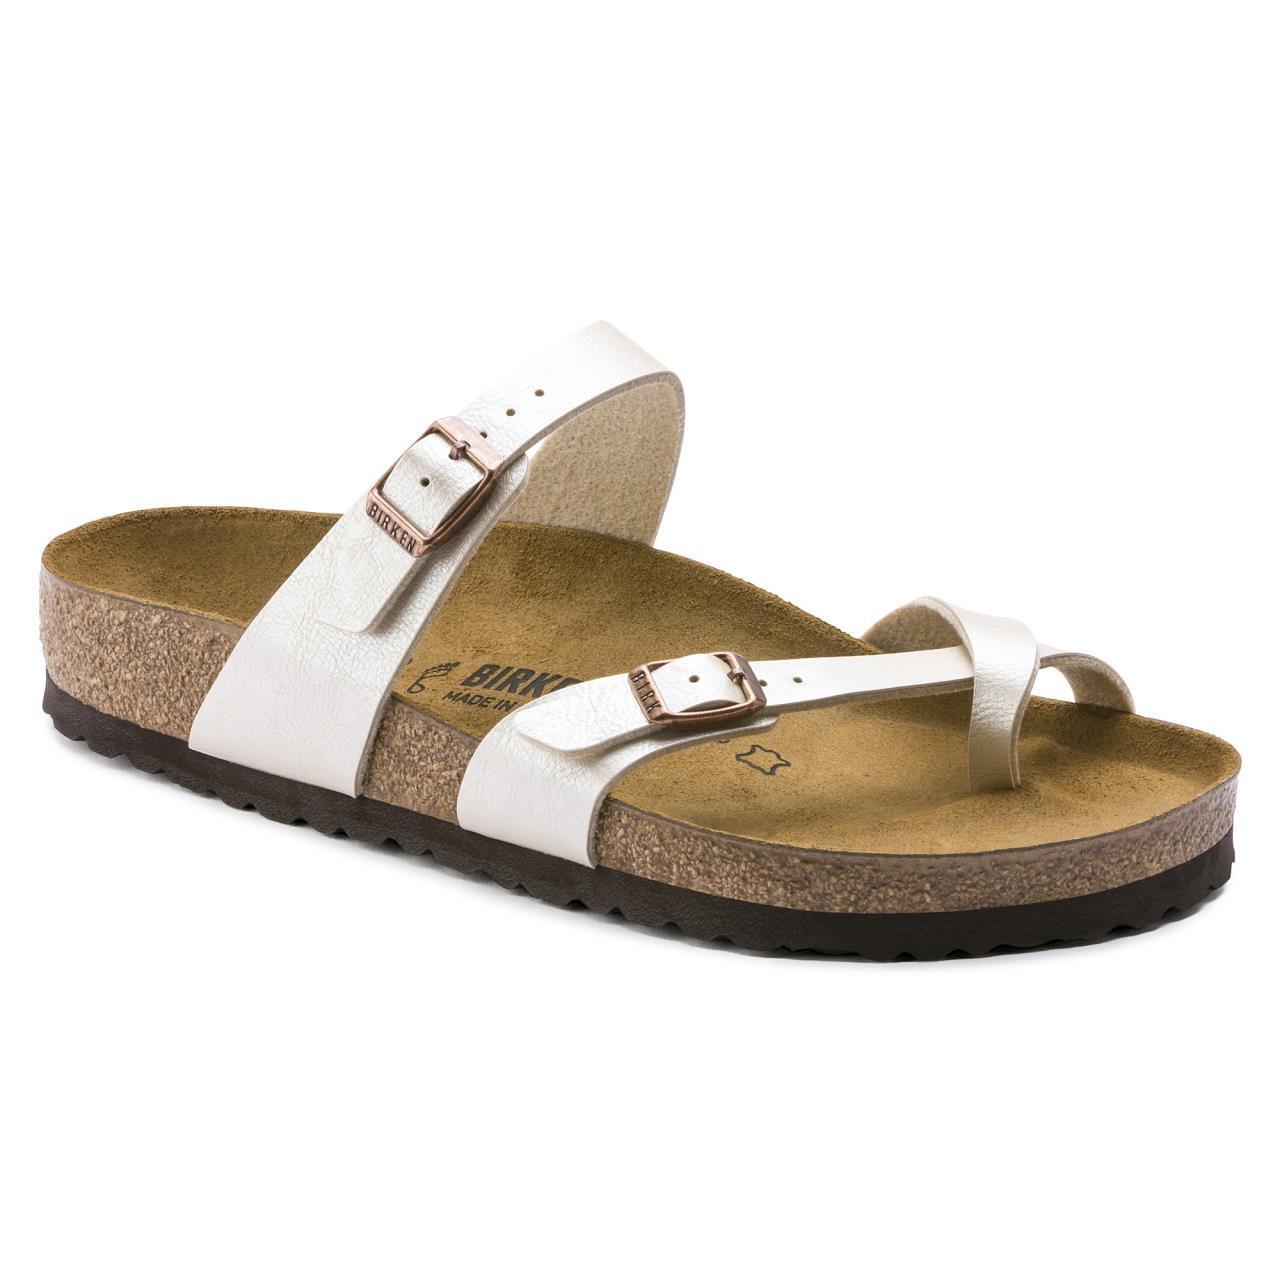 Birkenstock 71661 Mayari Graceful Pearl White - 809410892508